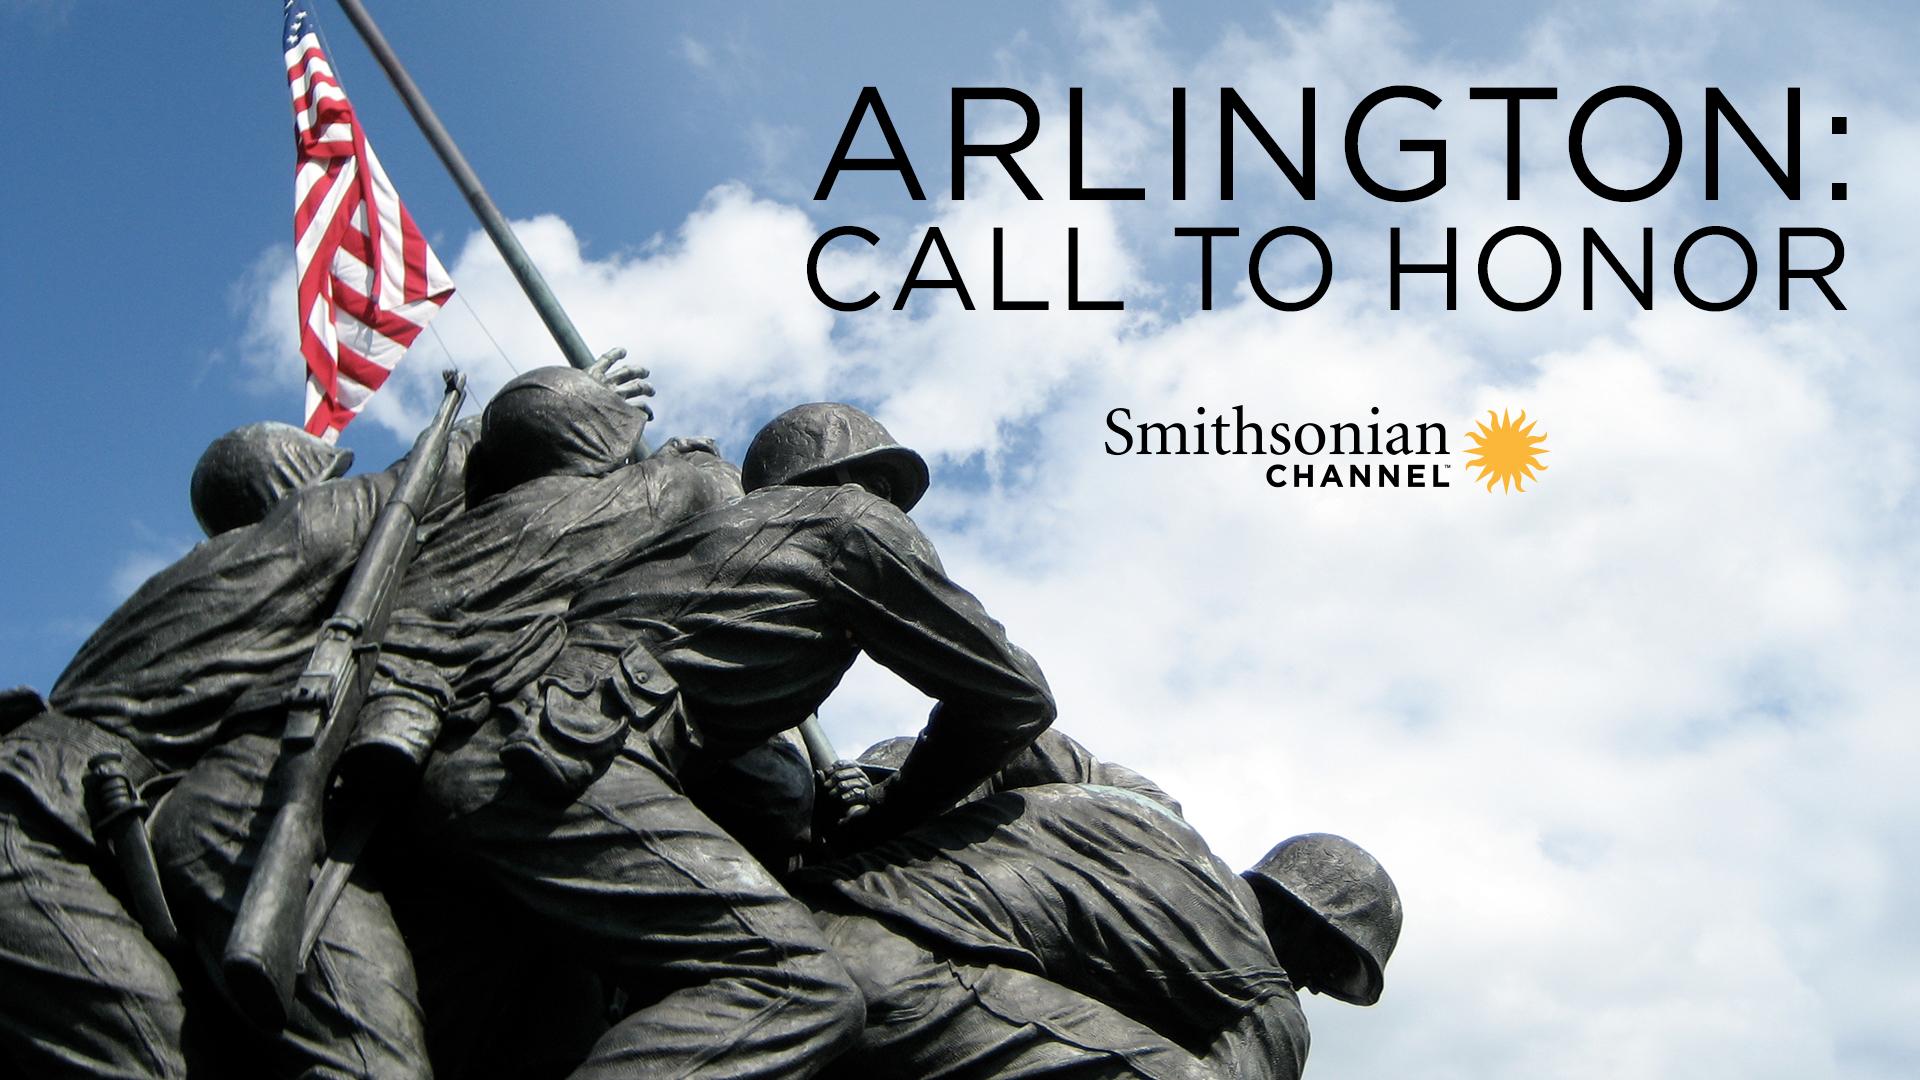 Arlington: Call to Honor